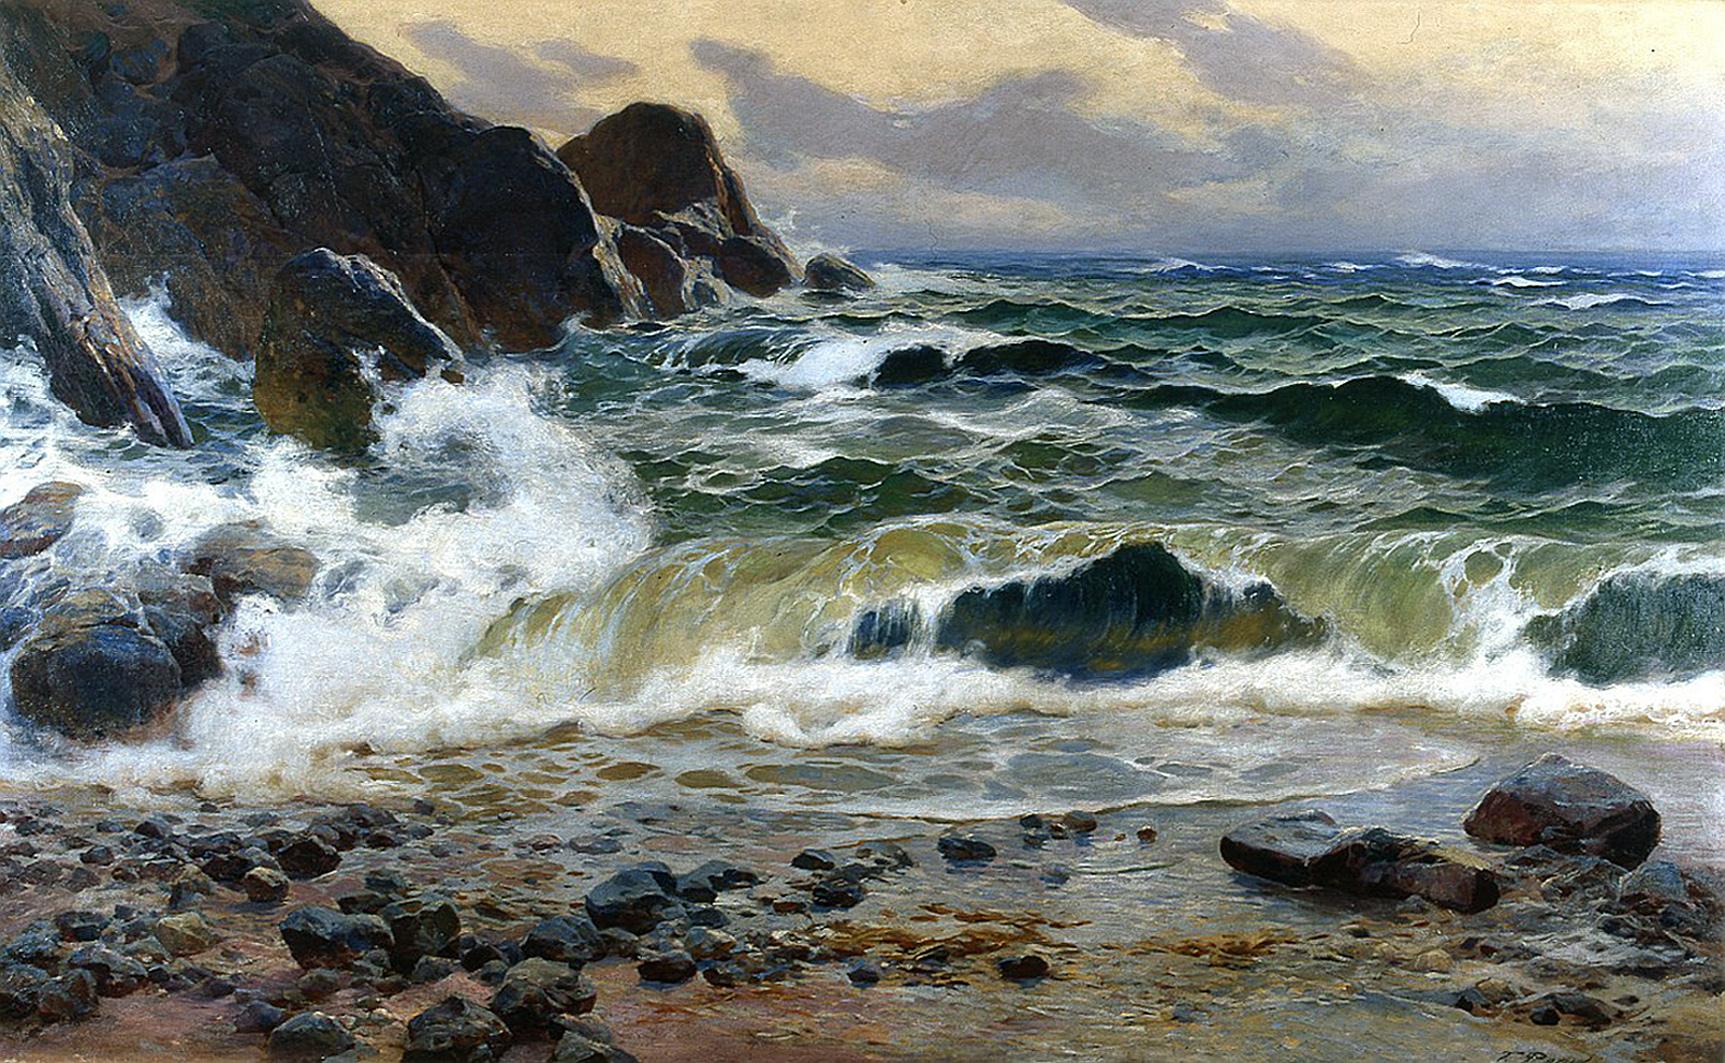 Тадеуш Попель. Сорренто море, 1904; олія, полотно; NMMG